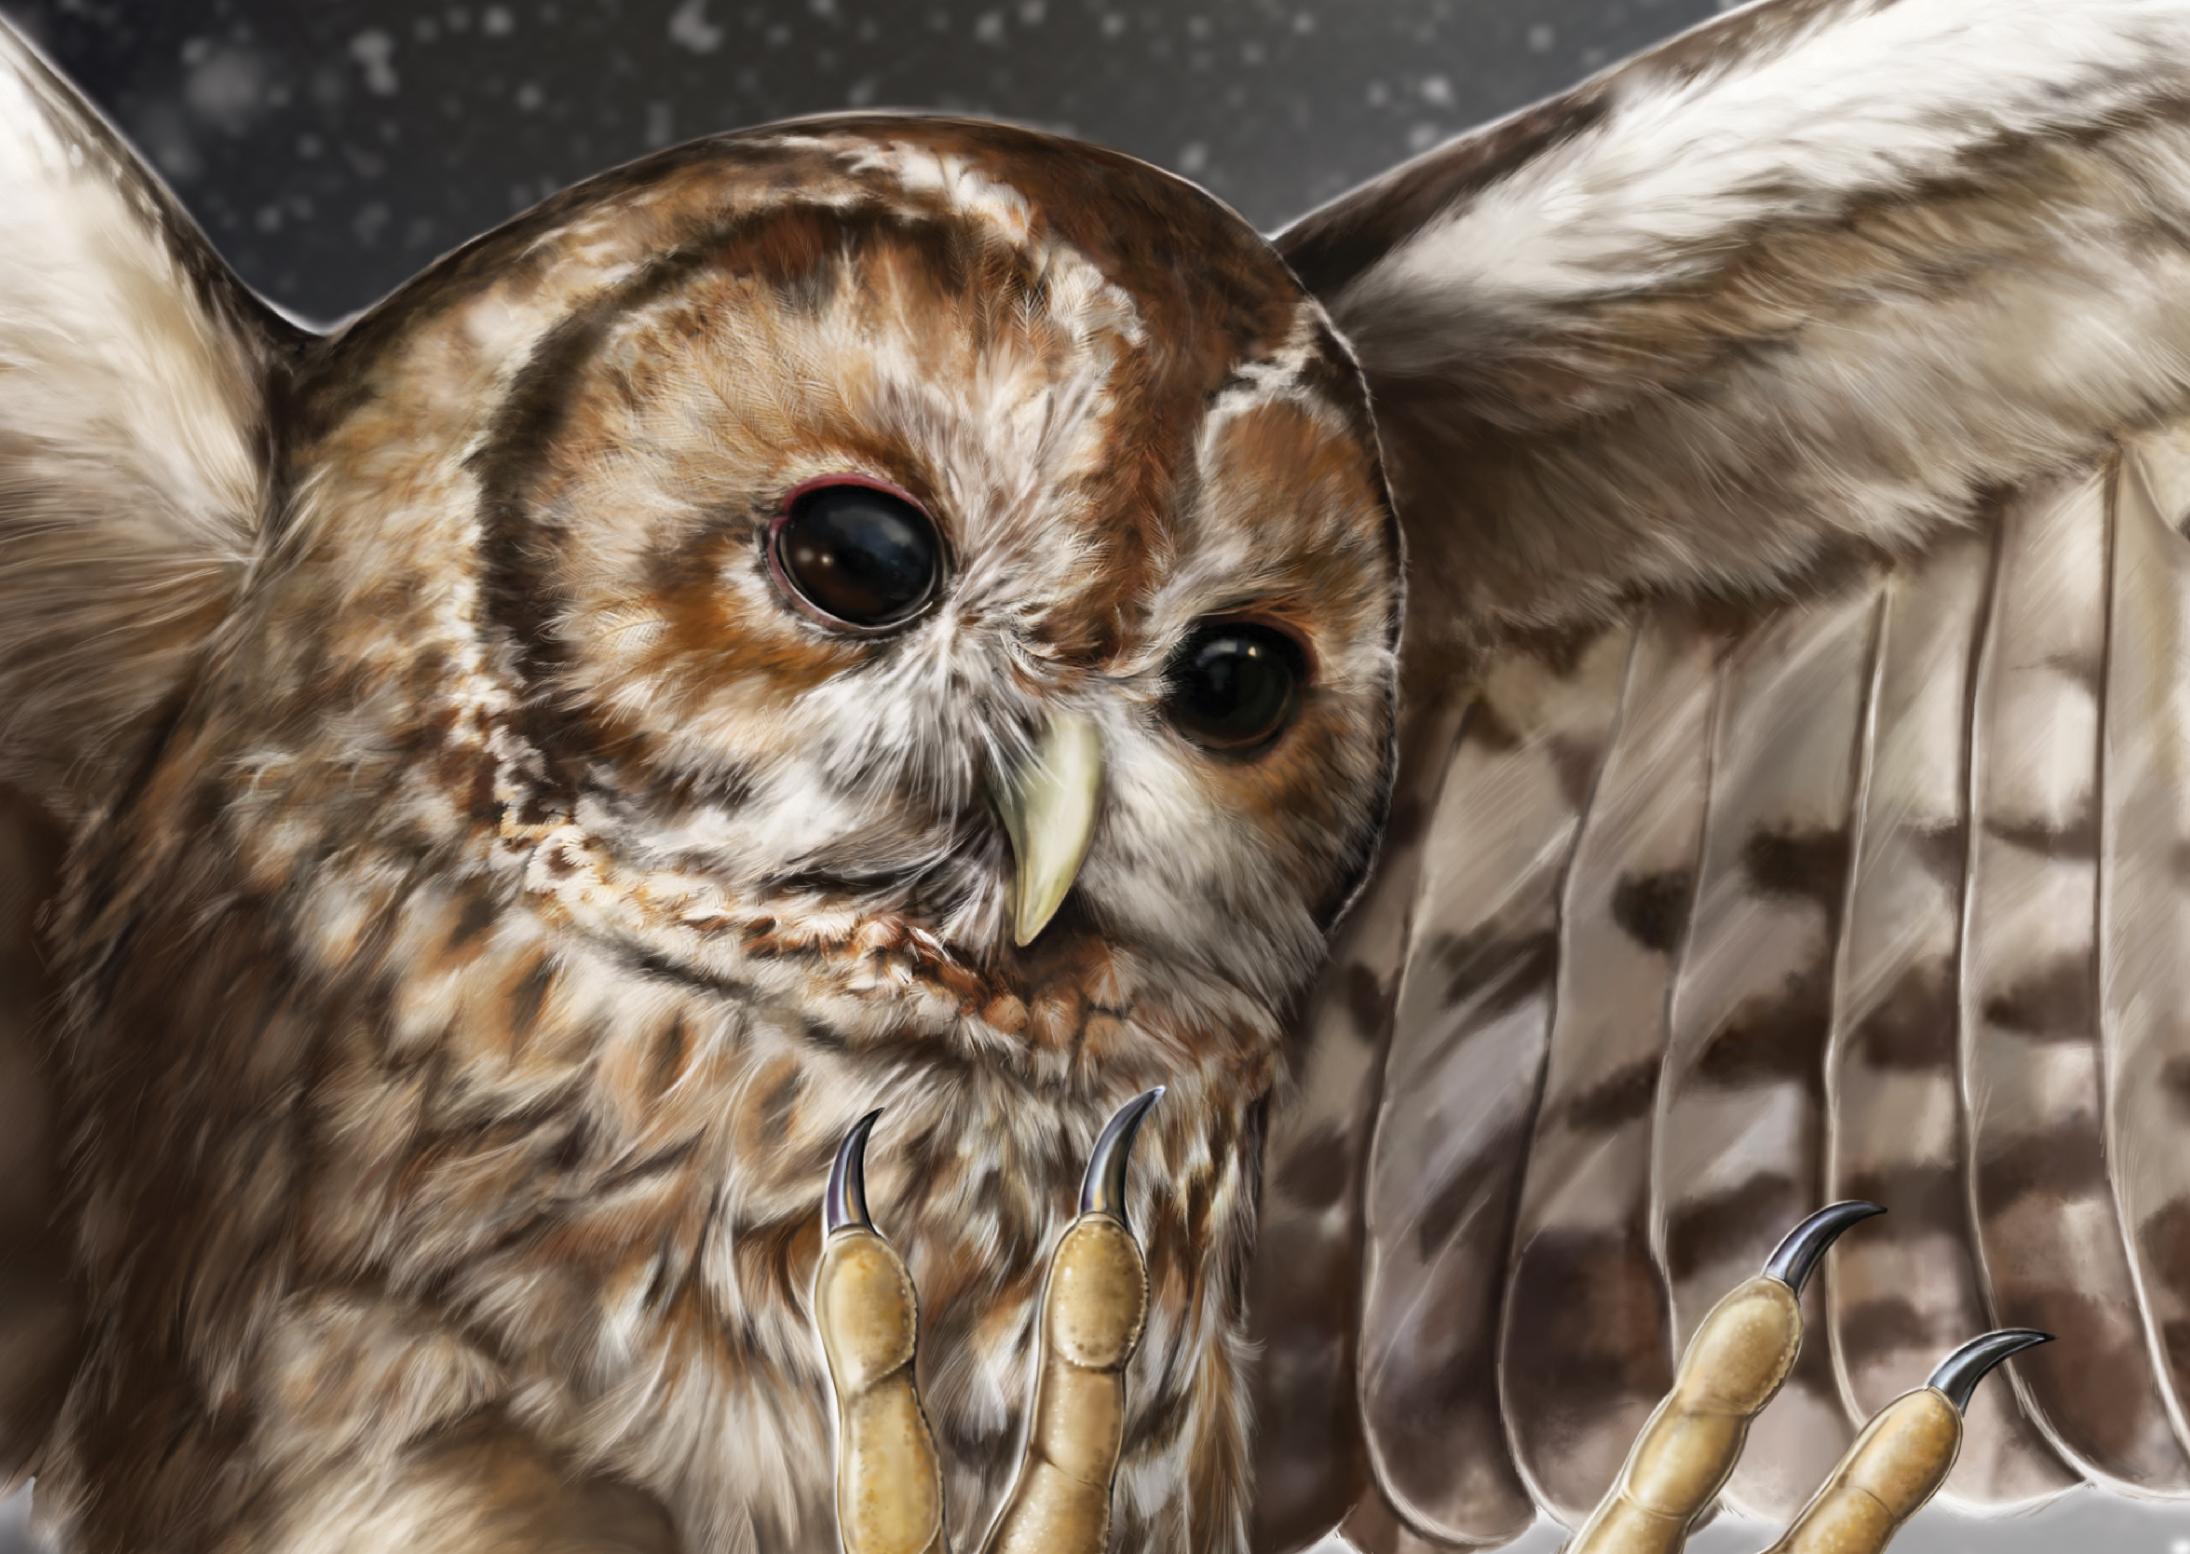 Tawny Owl: Detail